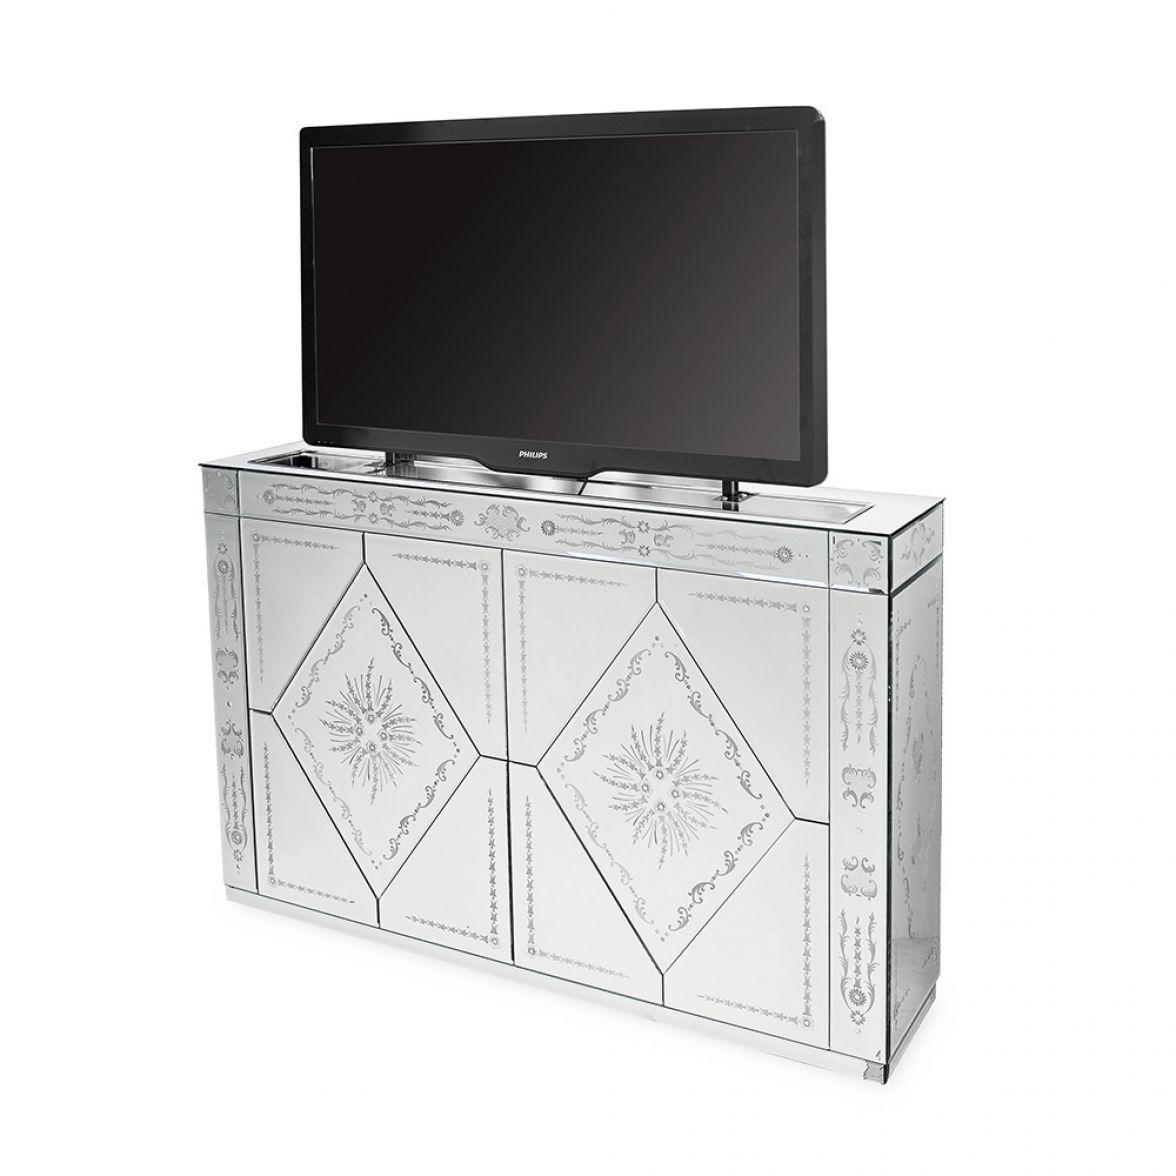 Murano TV cabinet  фото цена